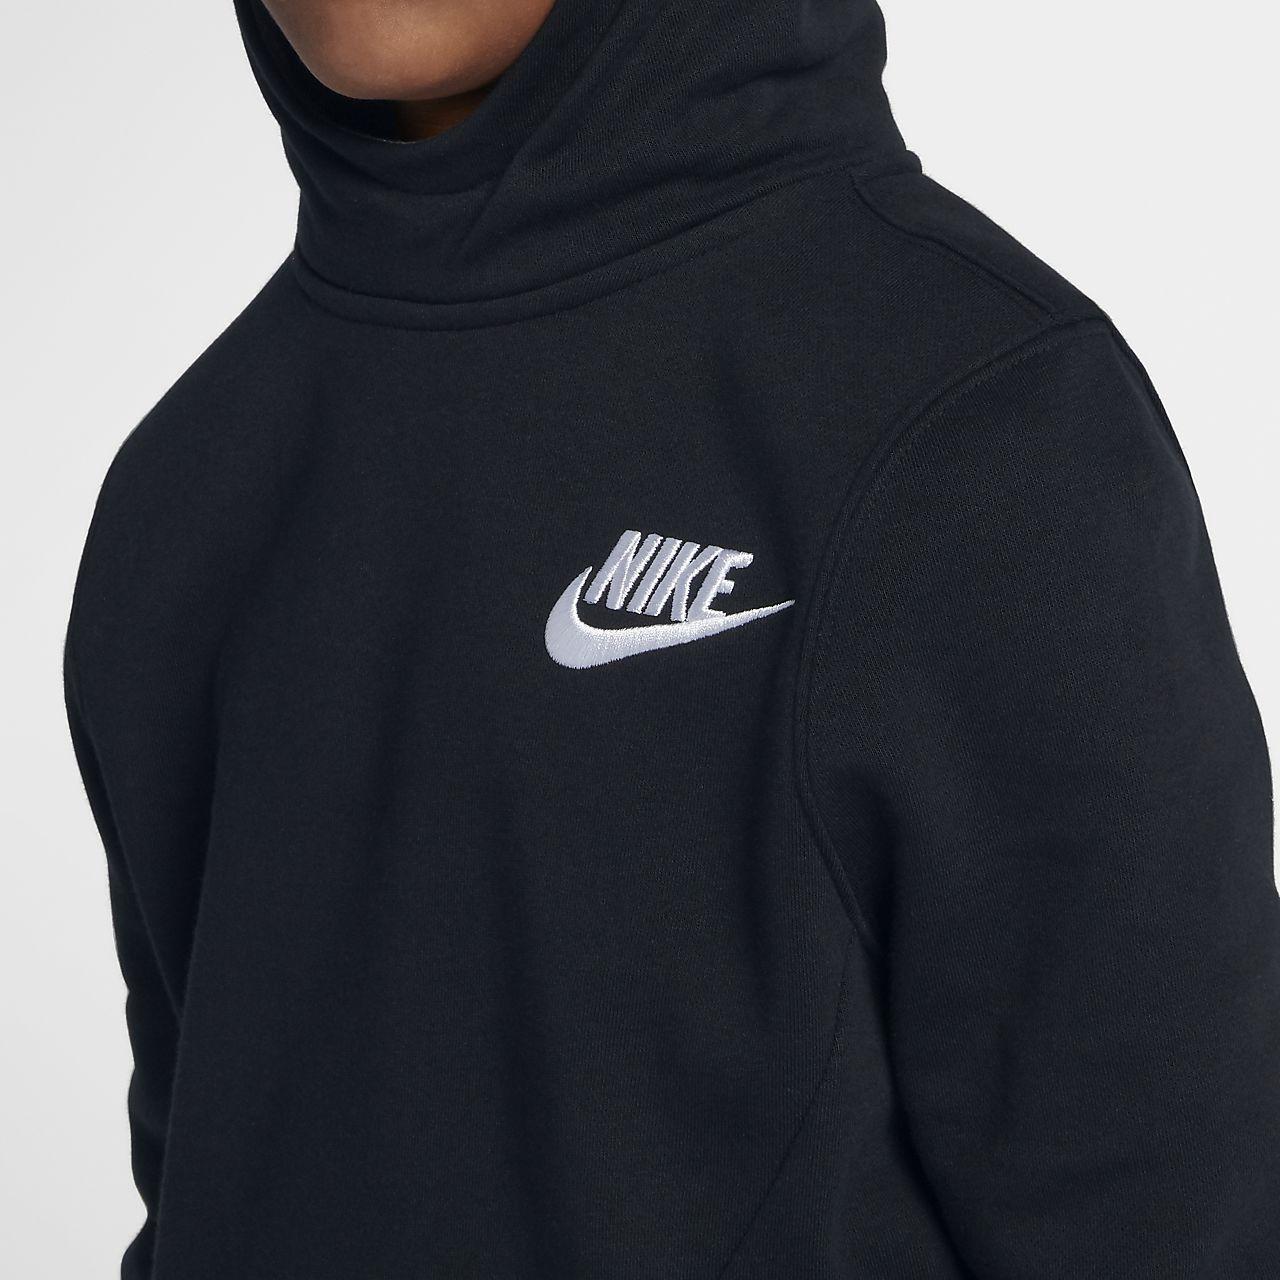 12d4bdd9 Nike Sportswear Big Kids' (Boys') Pullover Hoodie